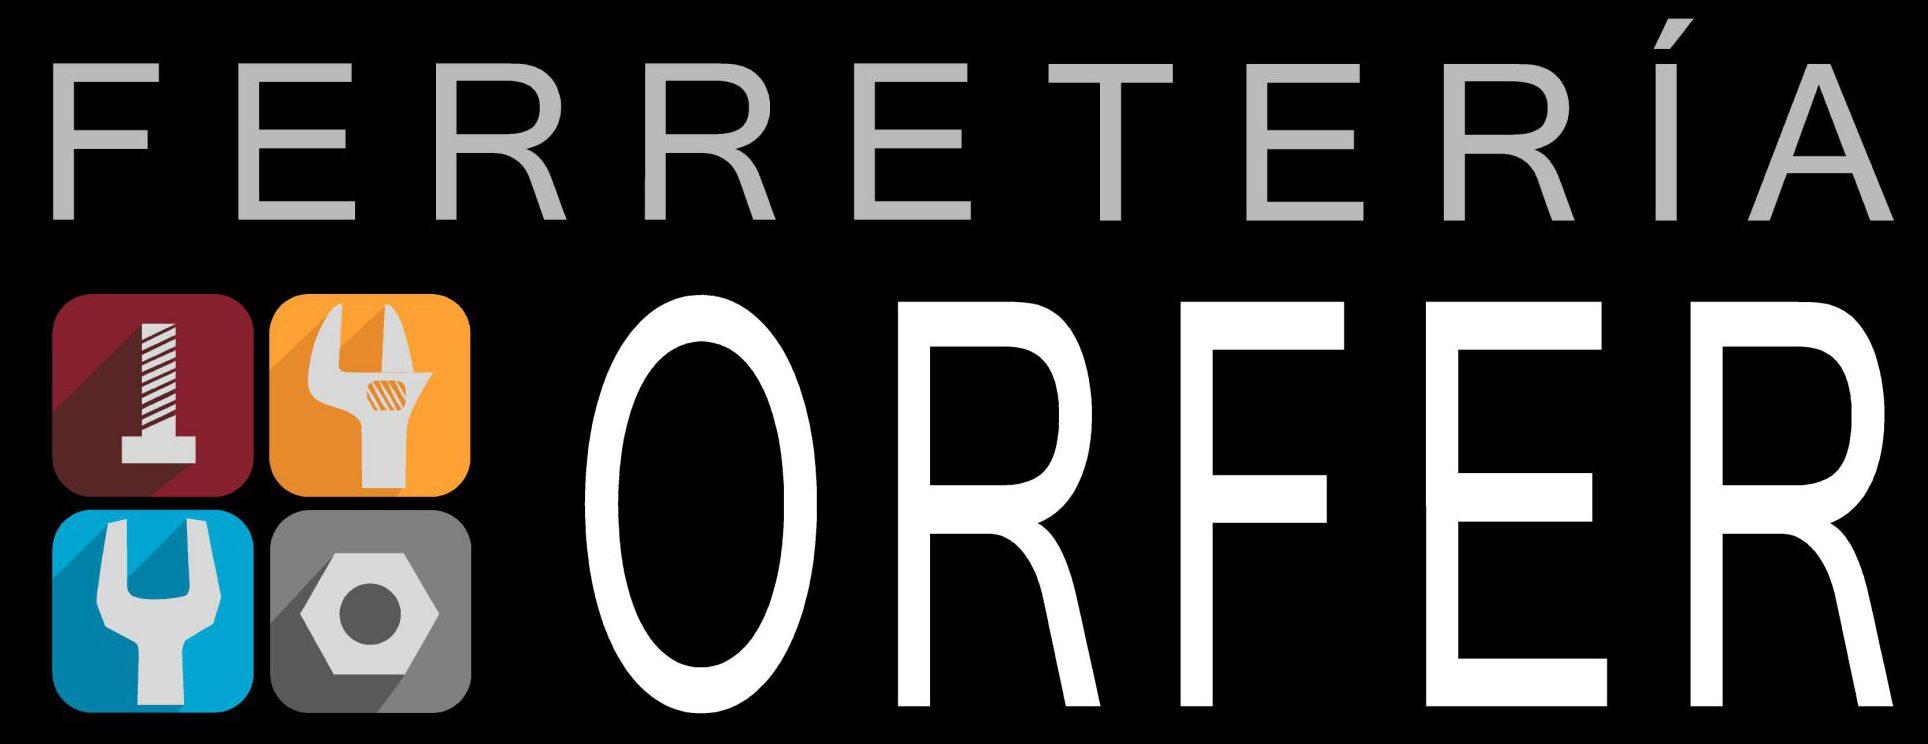 FERRETERIA ORFER